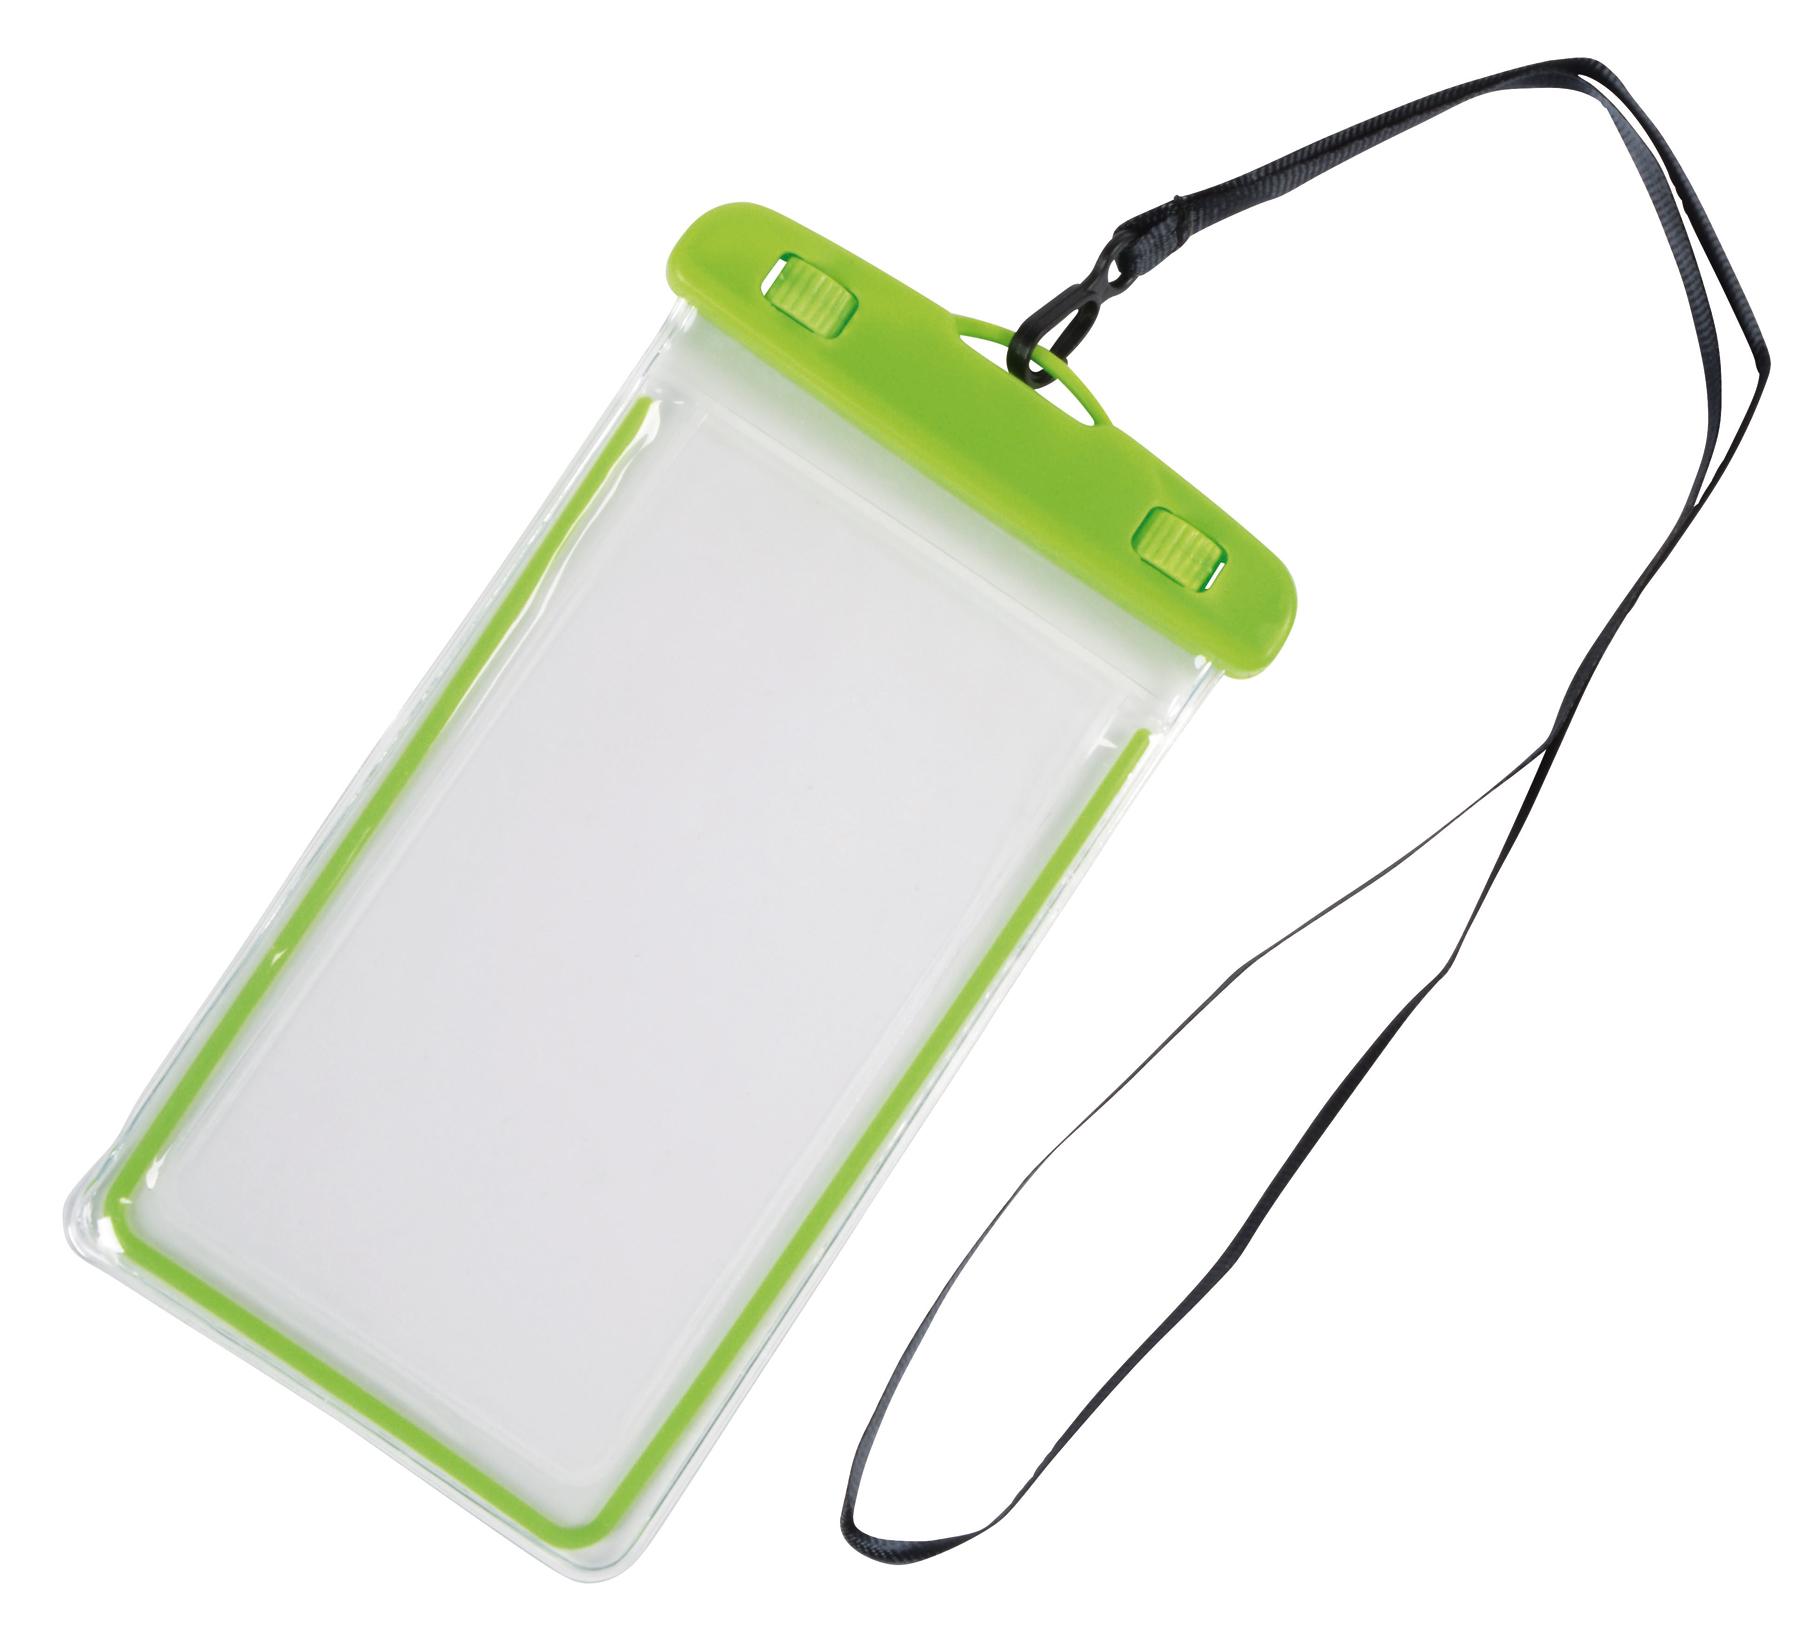 Torebka na telefon DIVER, transparentny, zielone jabłko